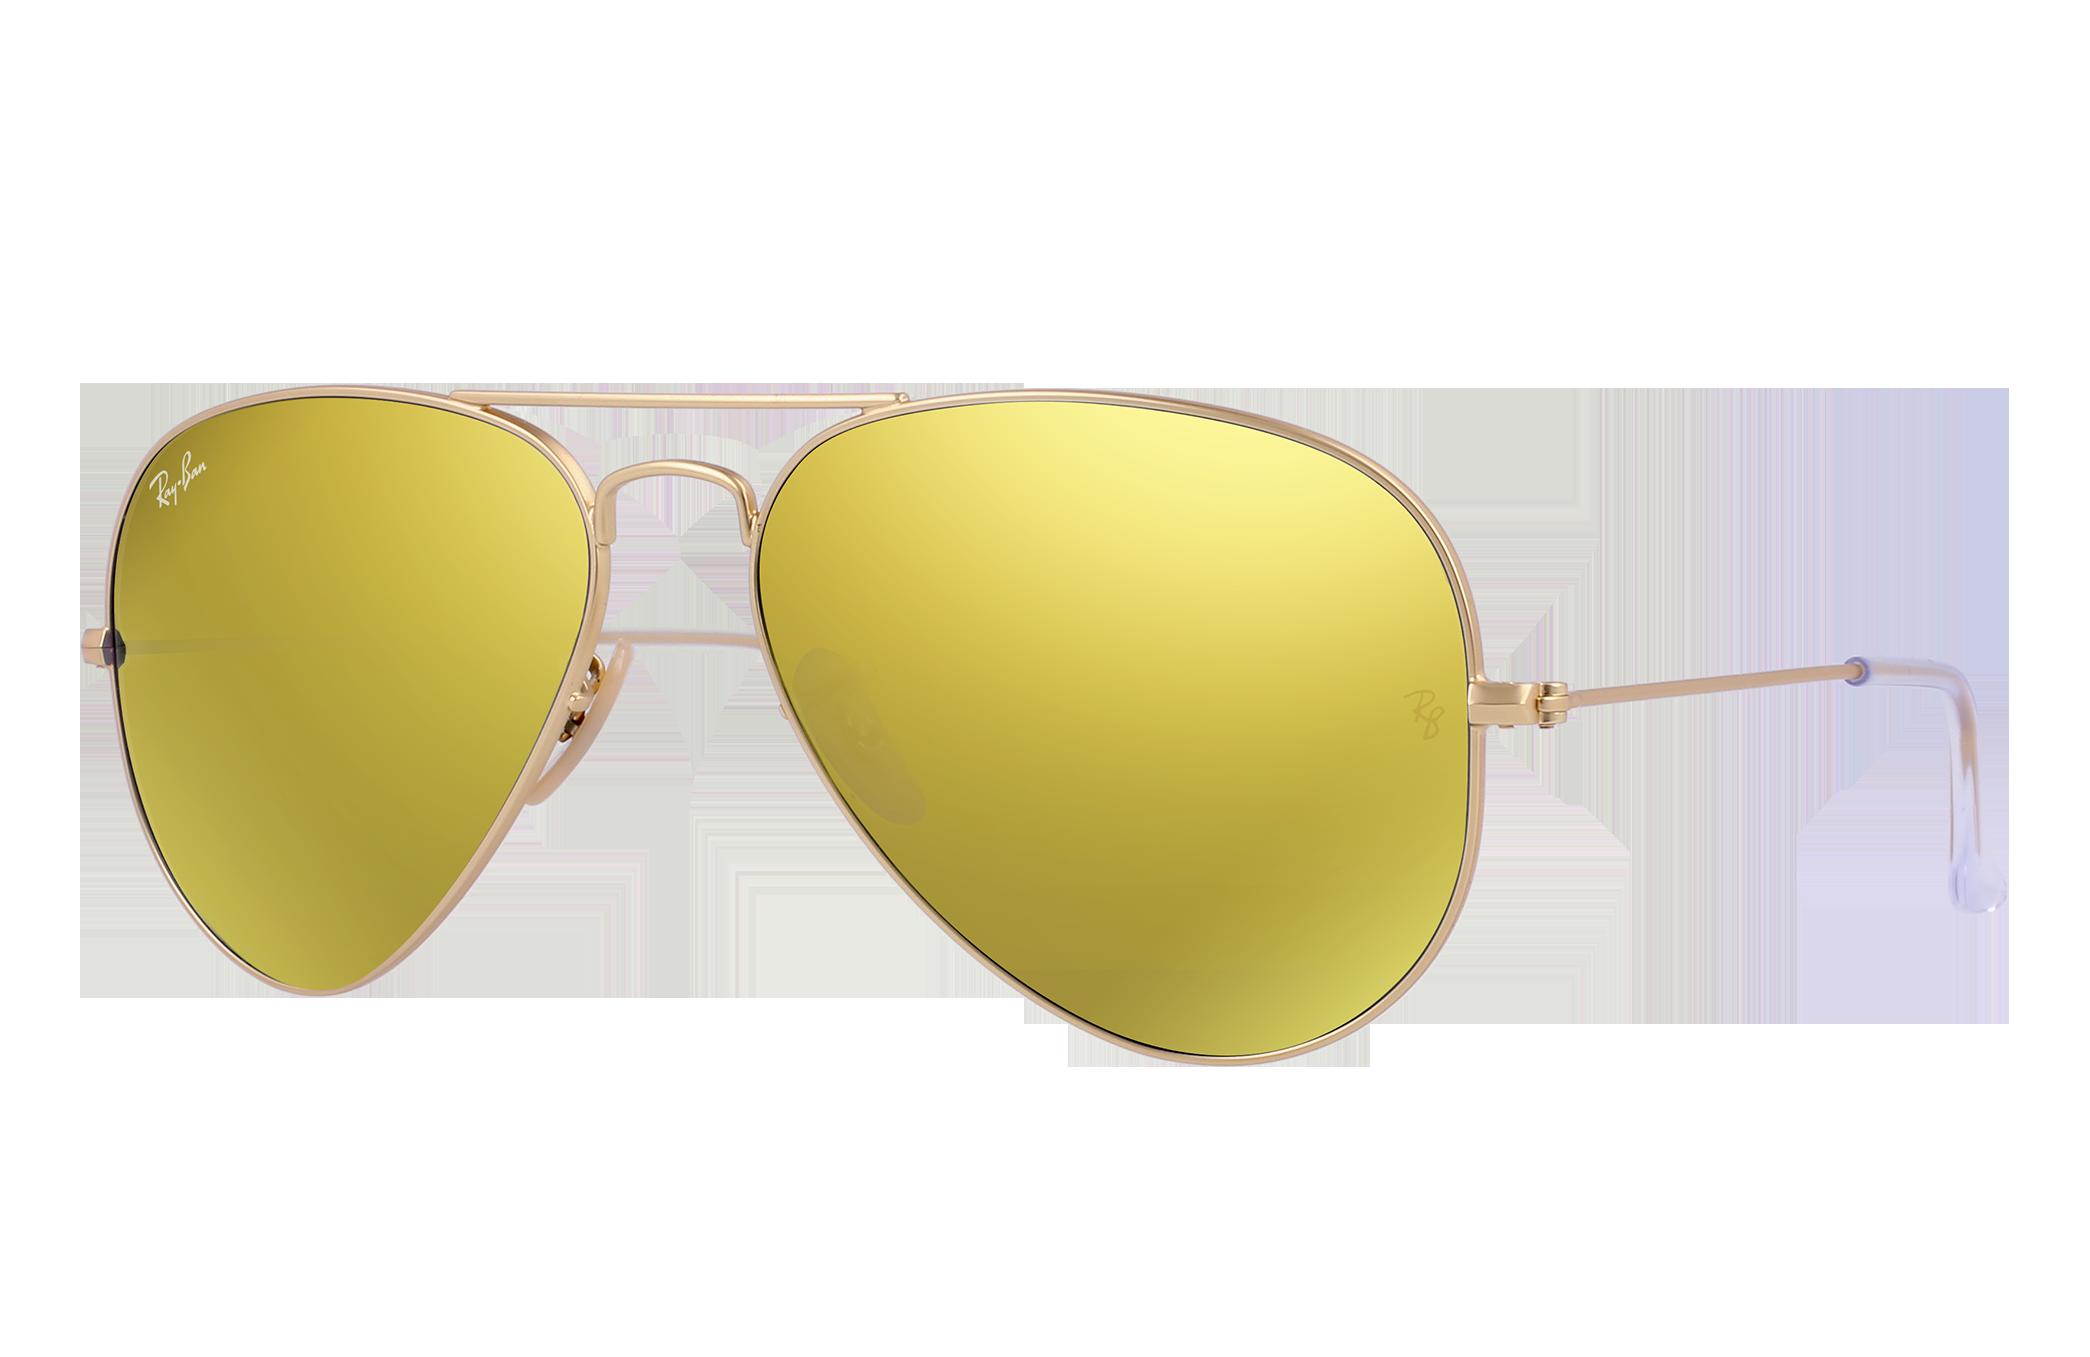 Ray-Ban Aviator Flash Lenses Gold, Yellow Lenses - RB3025